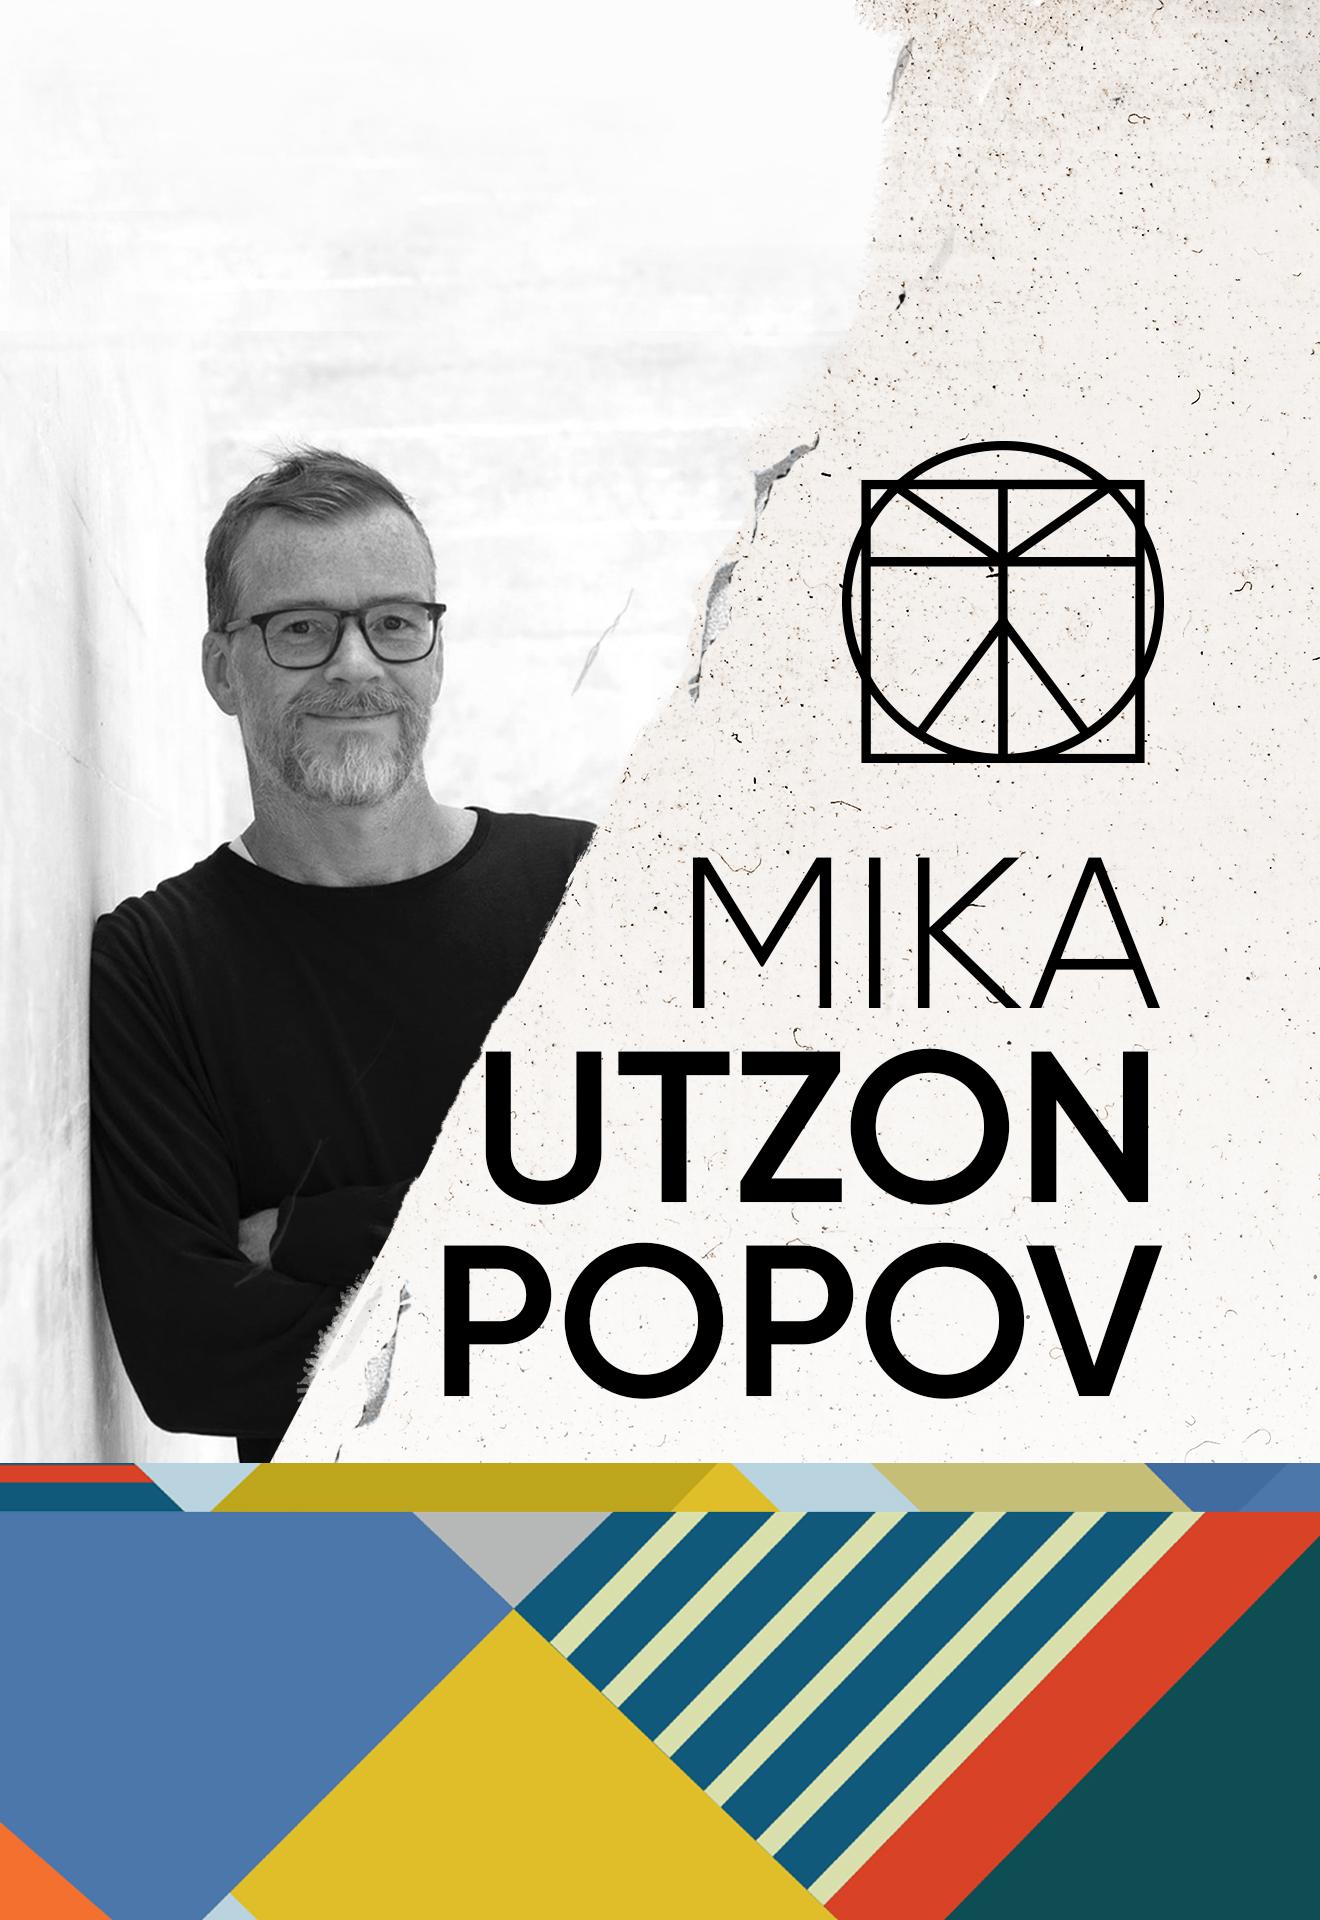 Mika Utzon Popov 2nd Renaissance